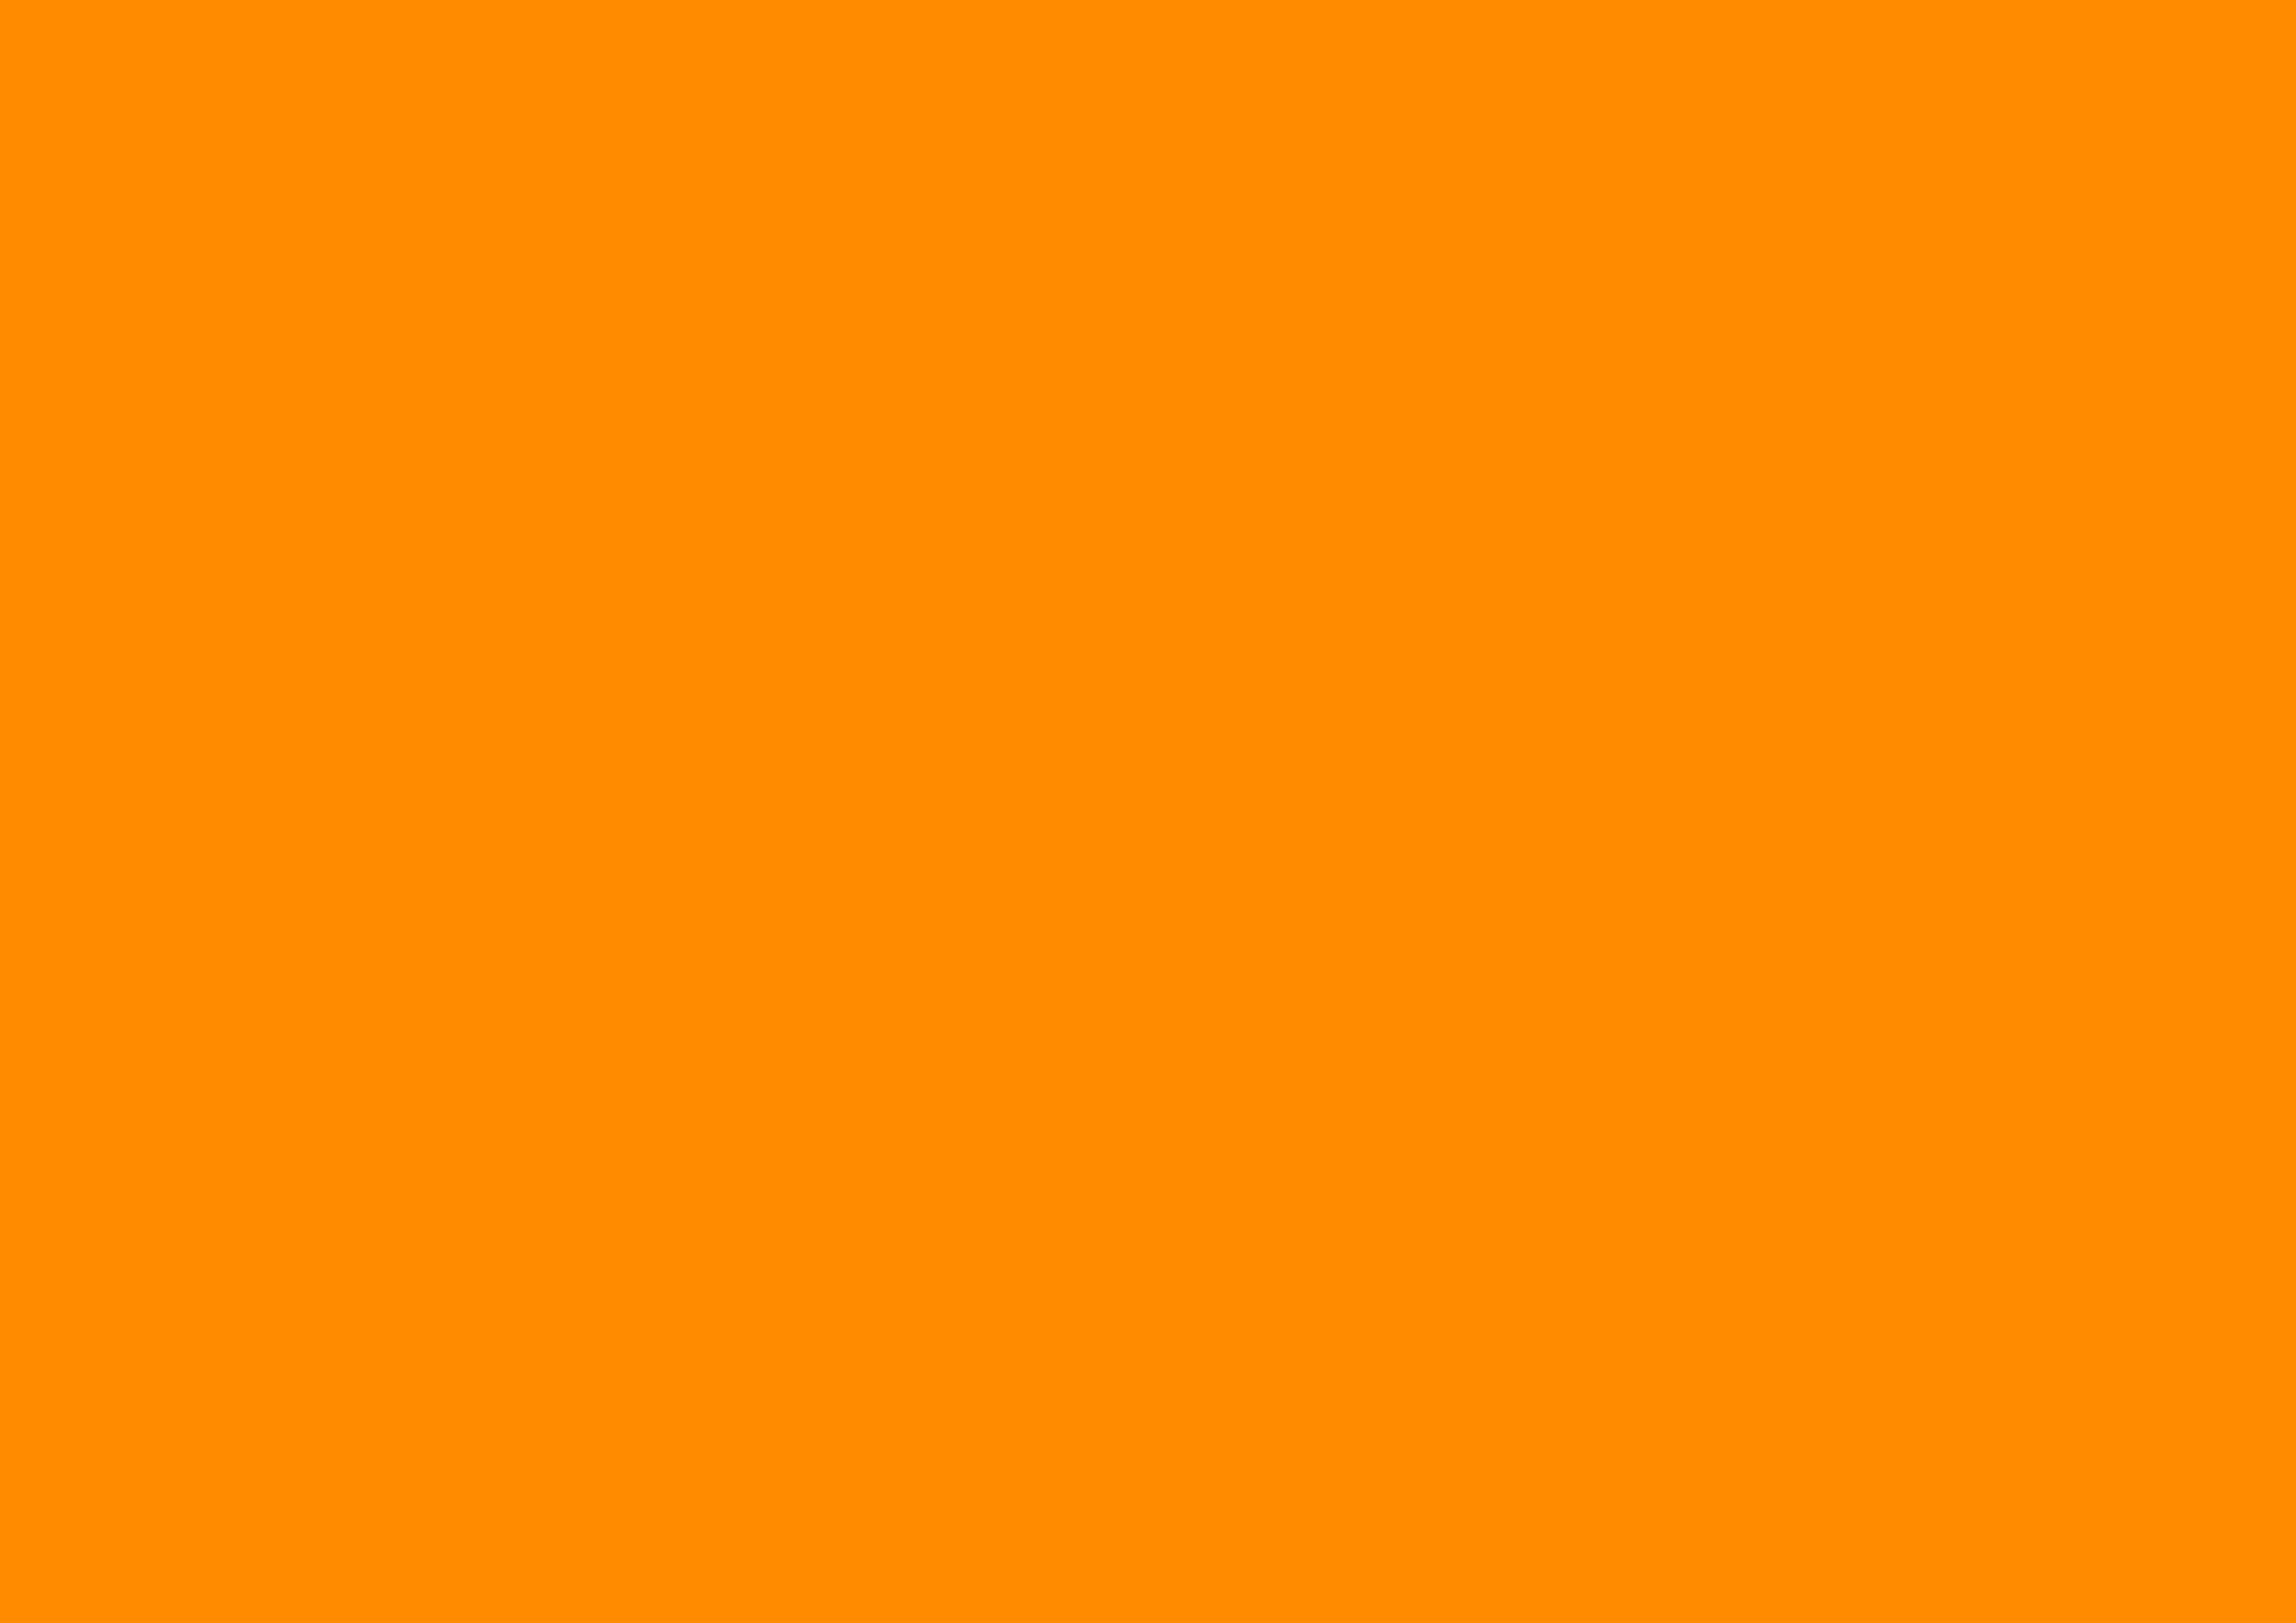 3508x2480 Dark Orange Solid Color Background